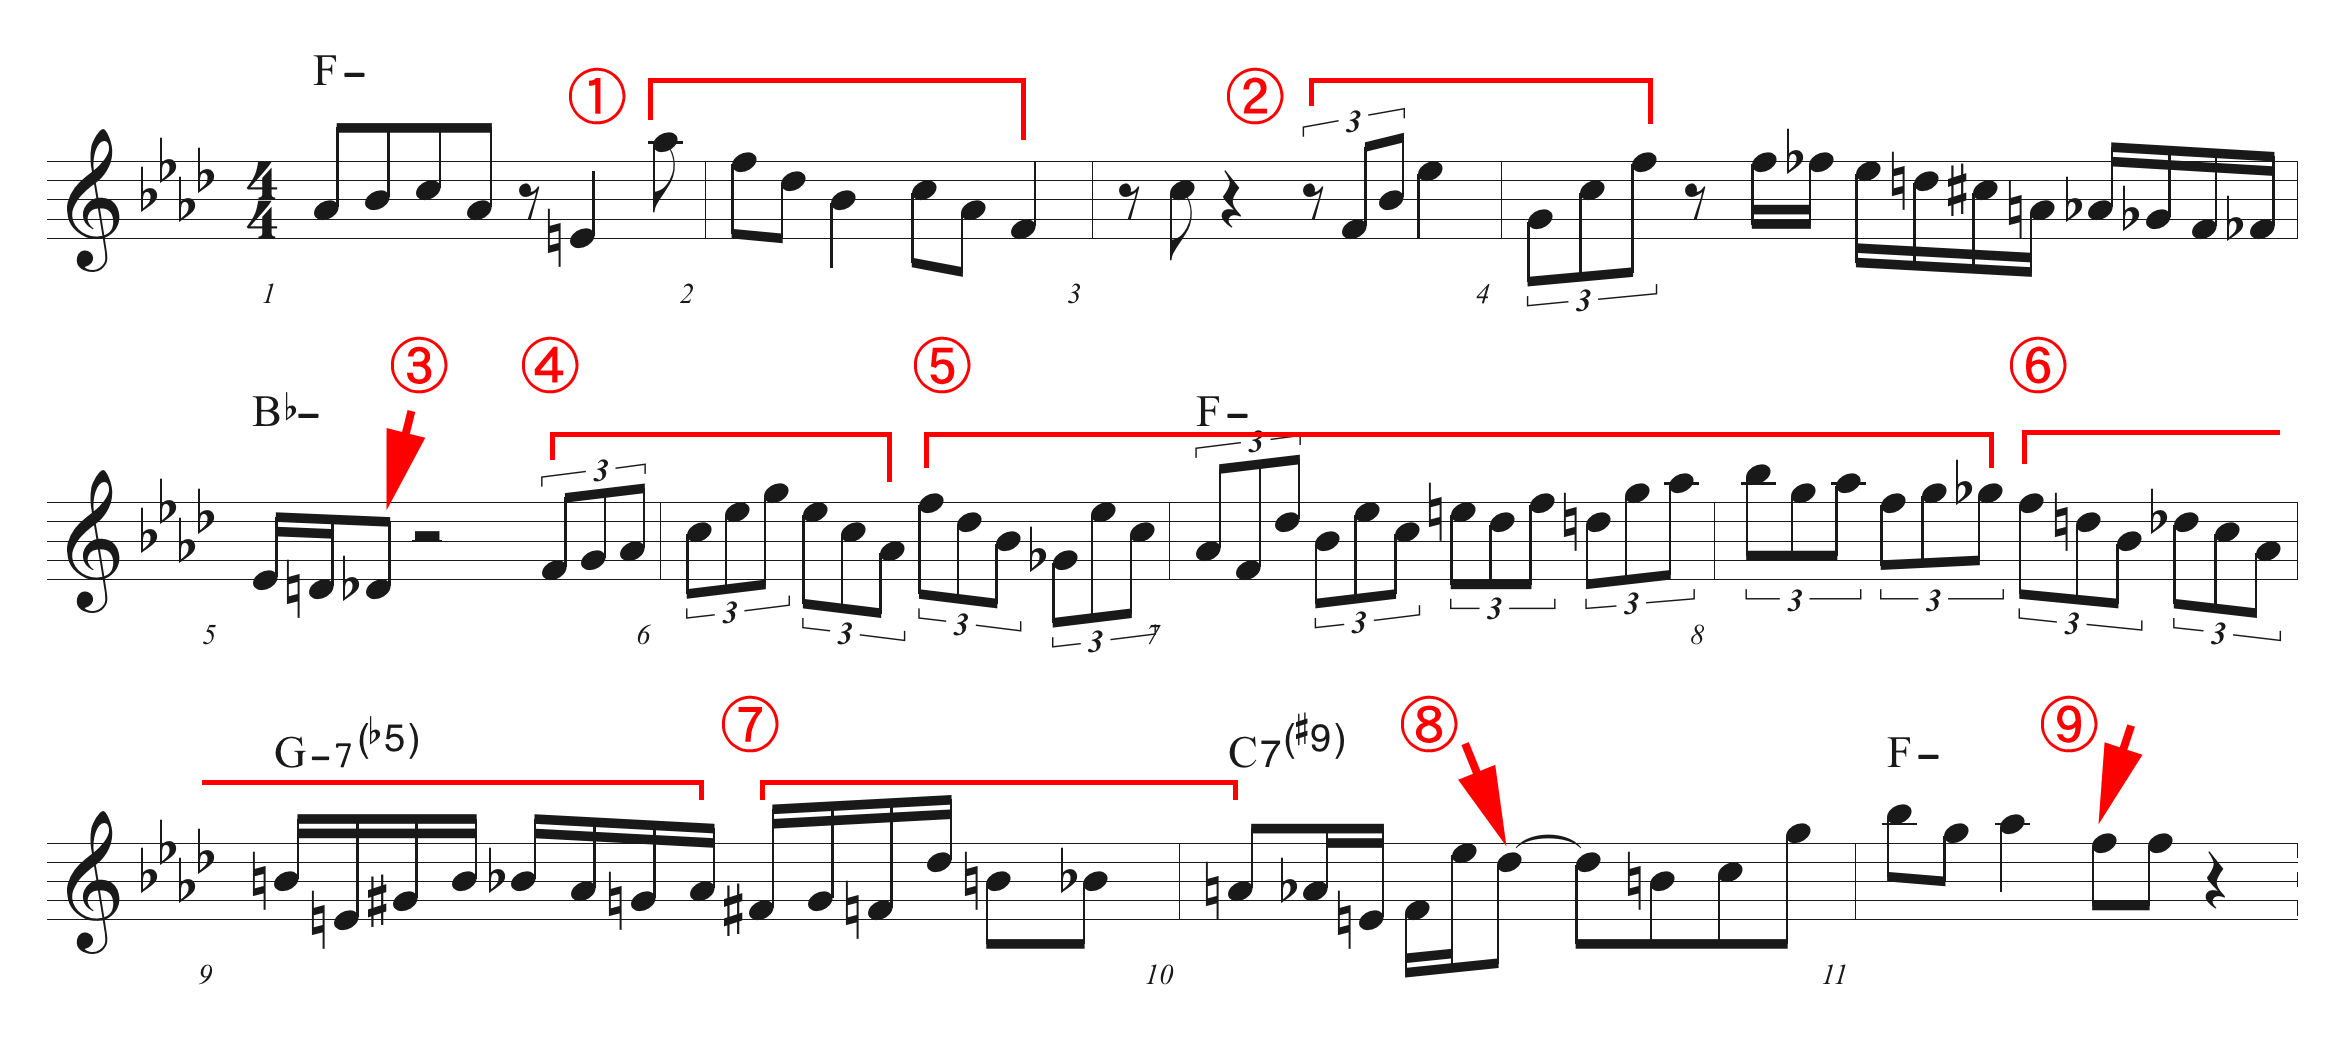 Interplay solo 2nd chorus